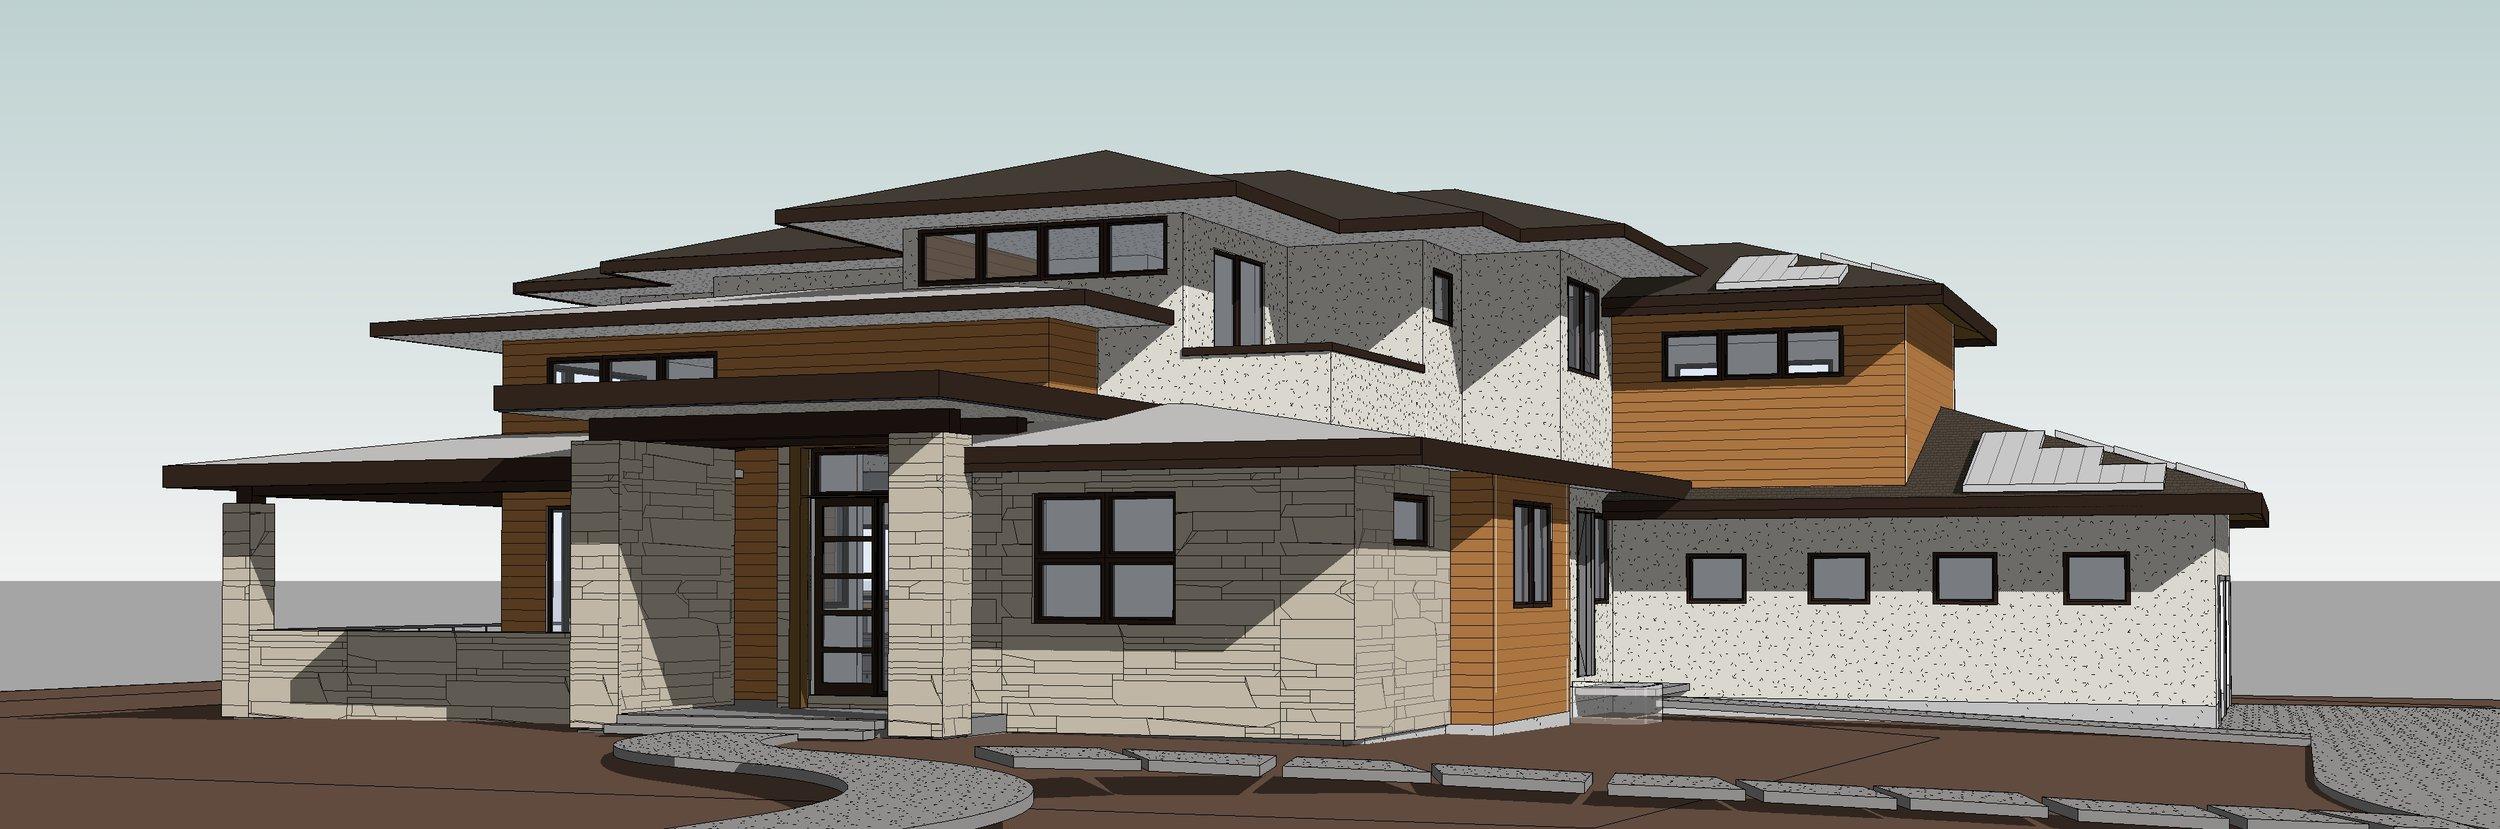 Crouse-Paulson Residence3 - 3D View - GARAGE SIDE.jpg